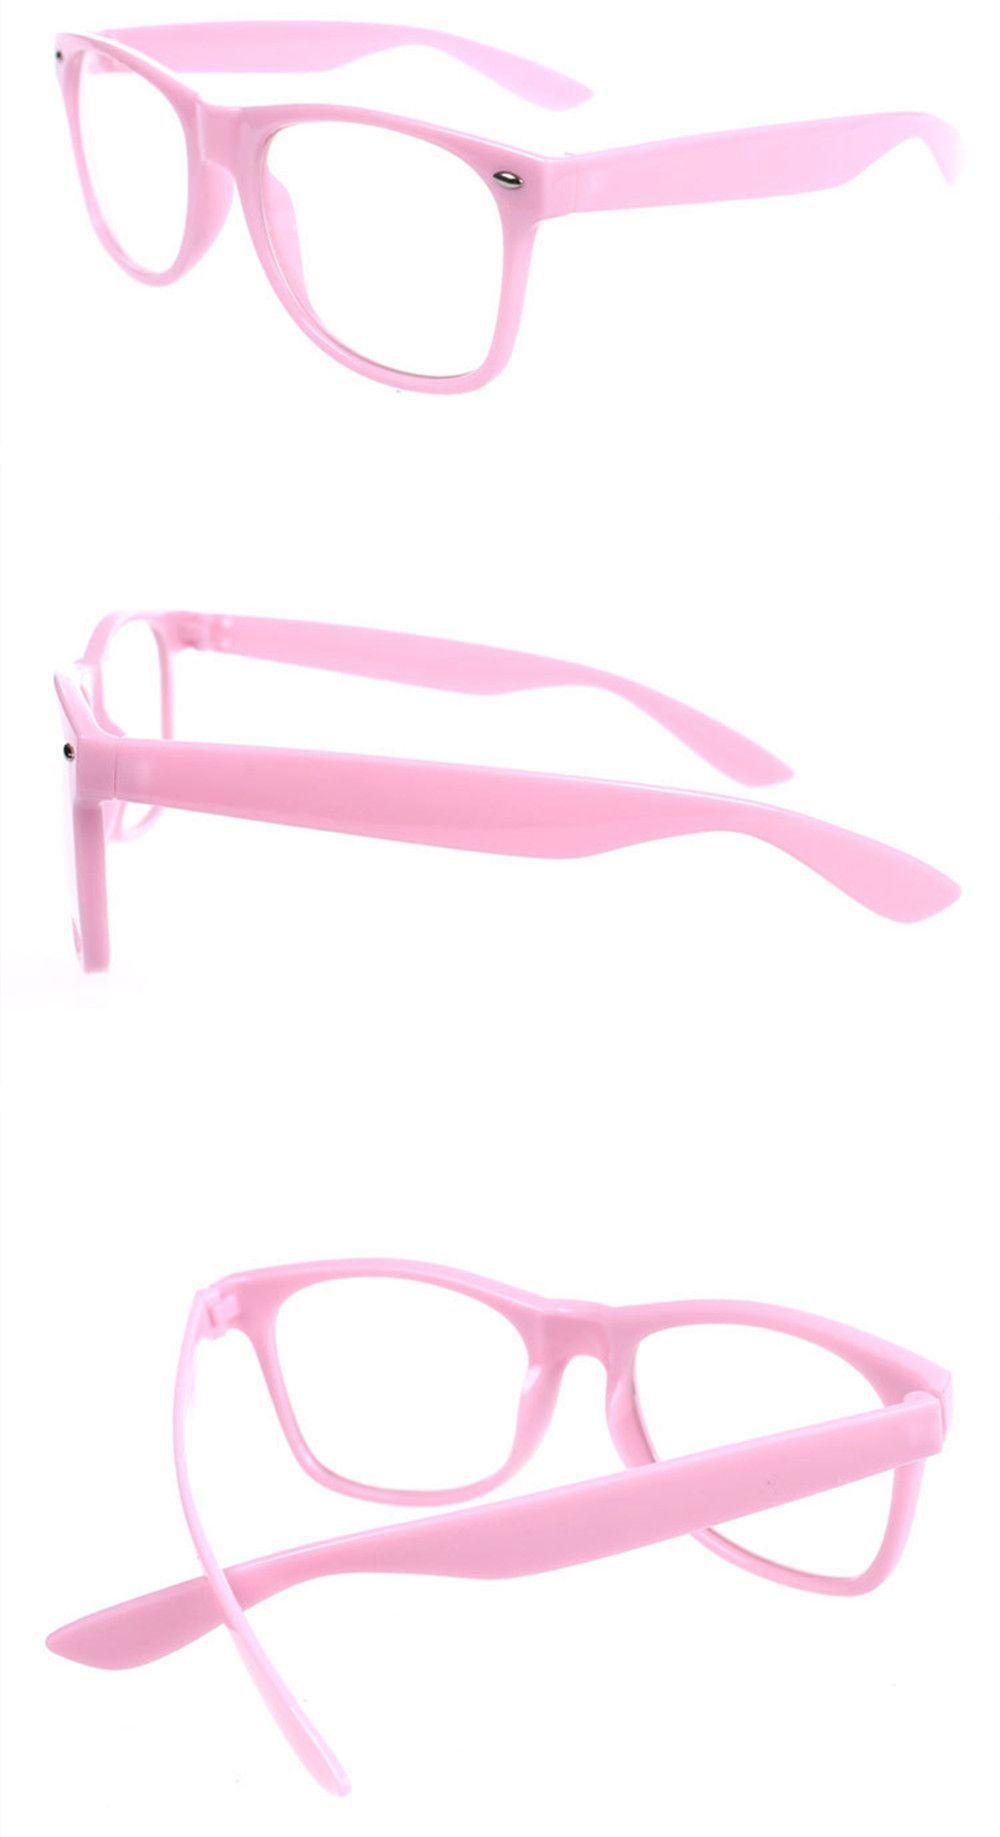 Vintage Inspired Classic Wayfarer Style Clear Lens Glasses Frame Eyewear